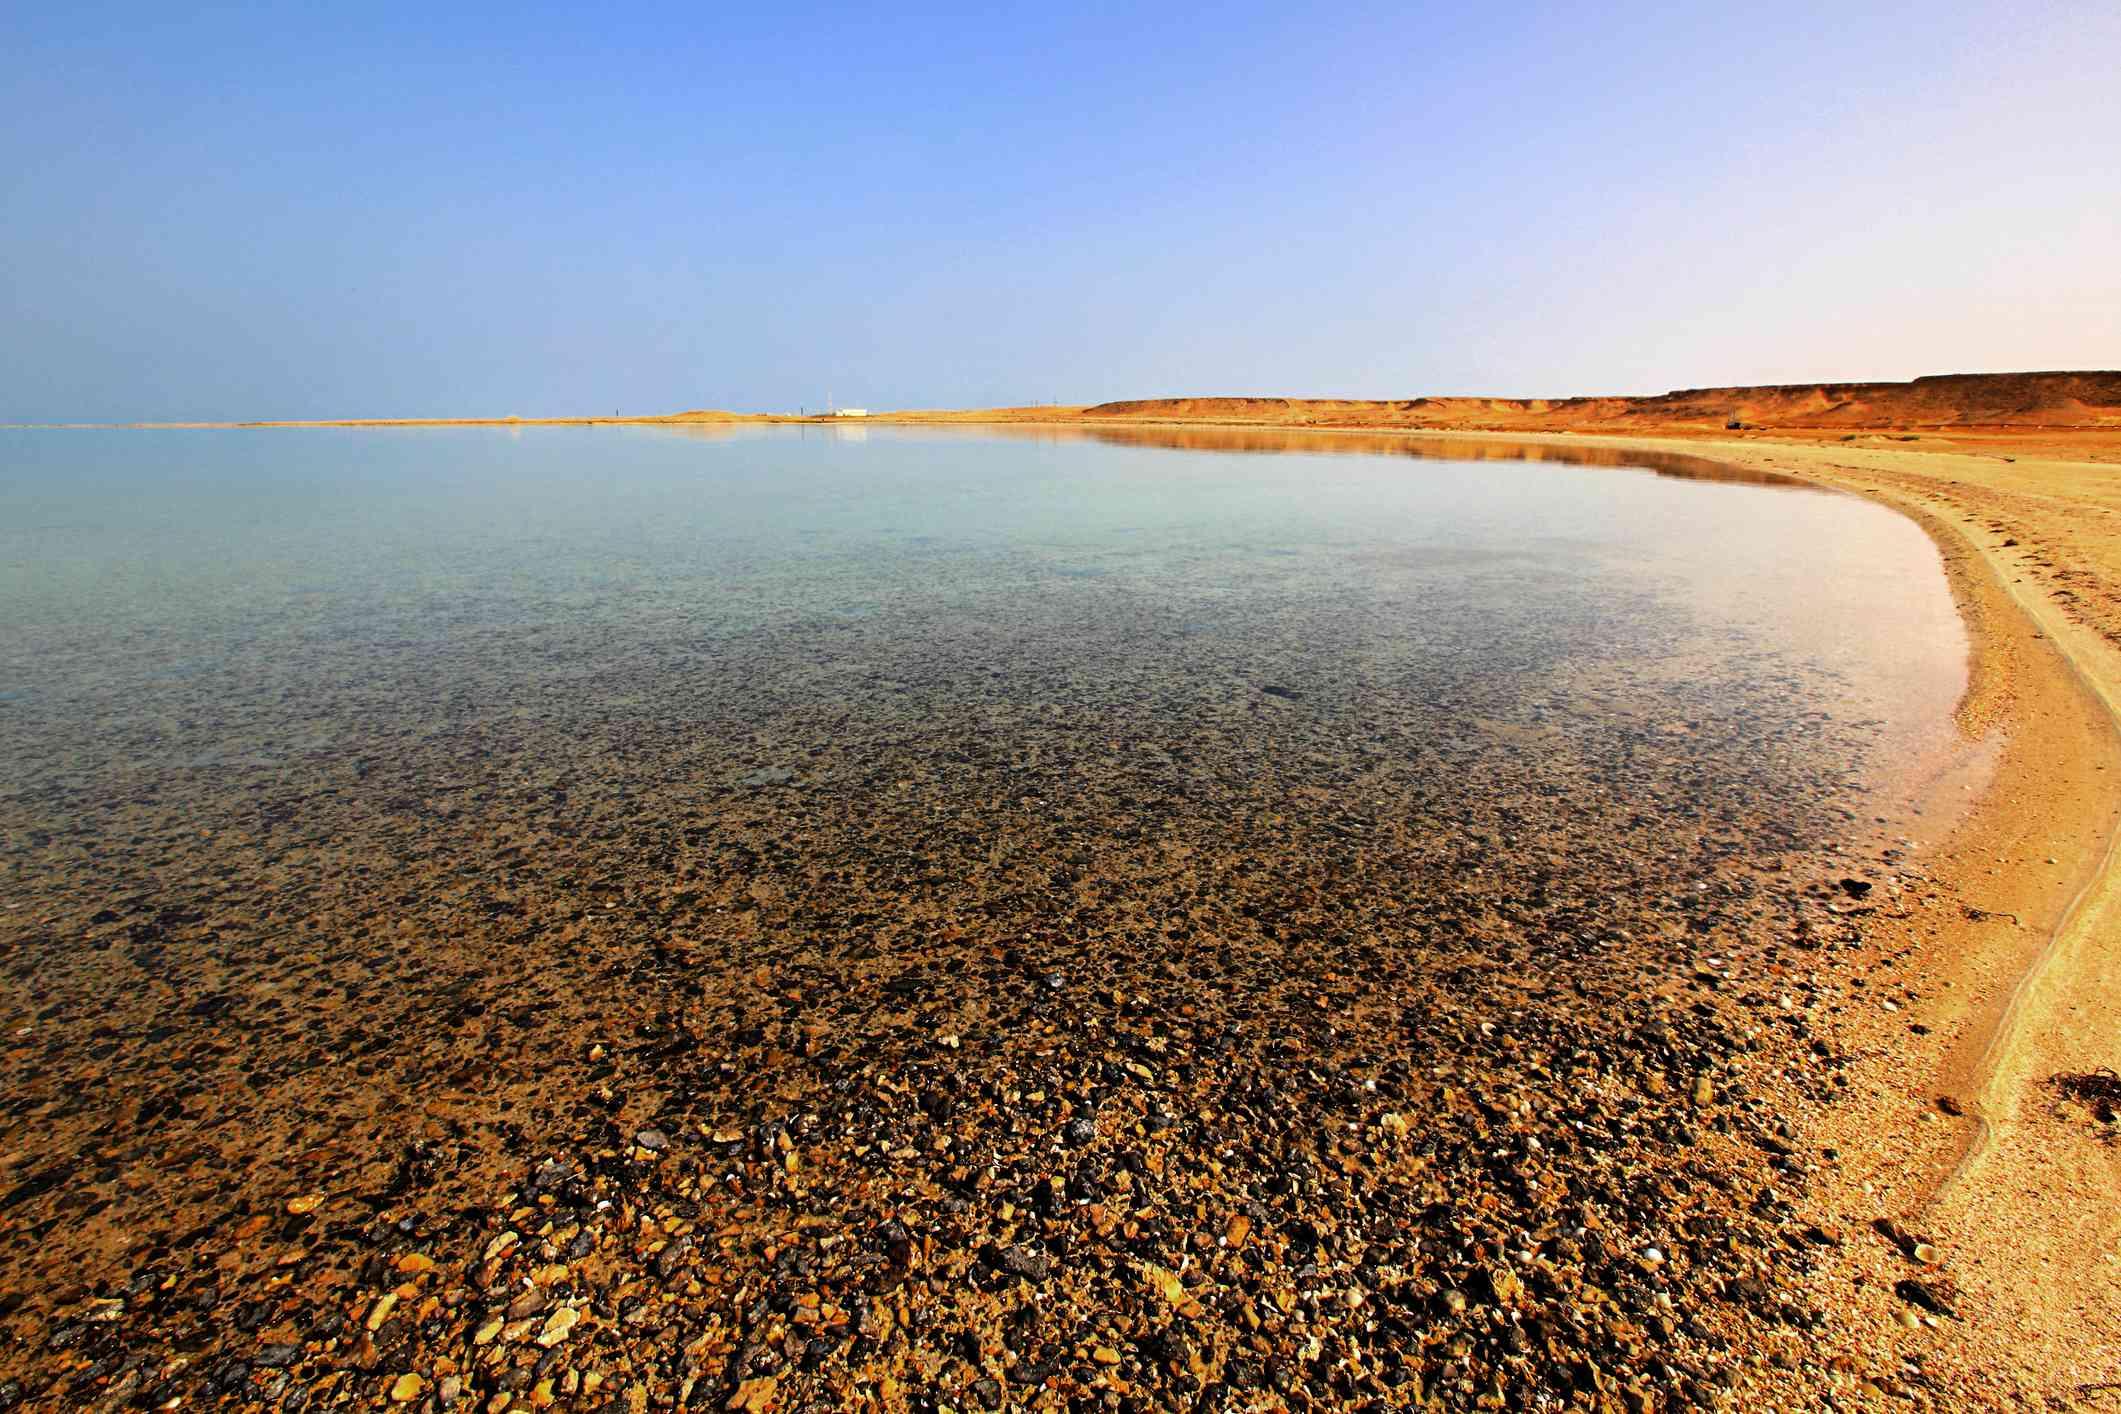 Rocky shore of Zekreet beach in Qatar